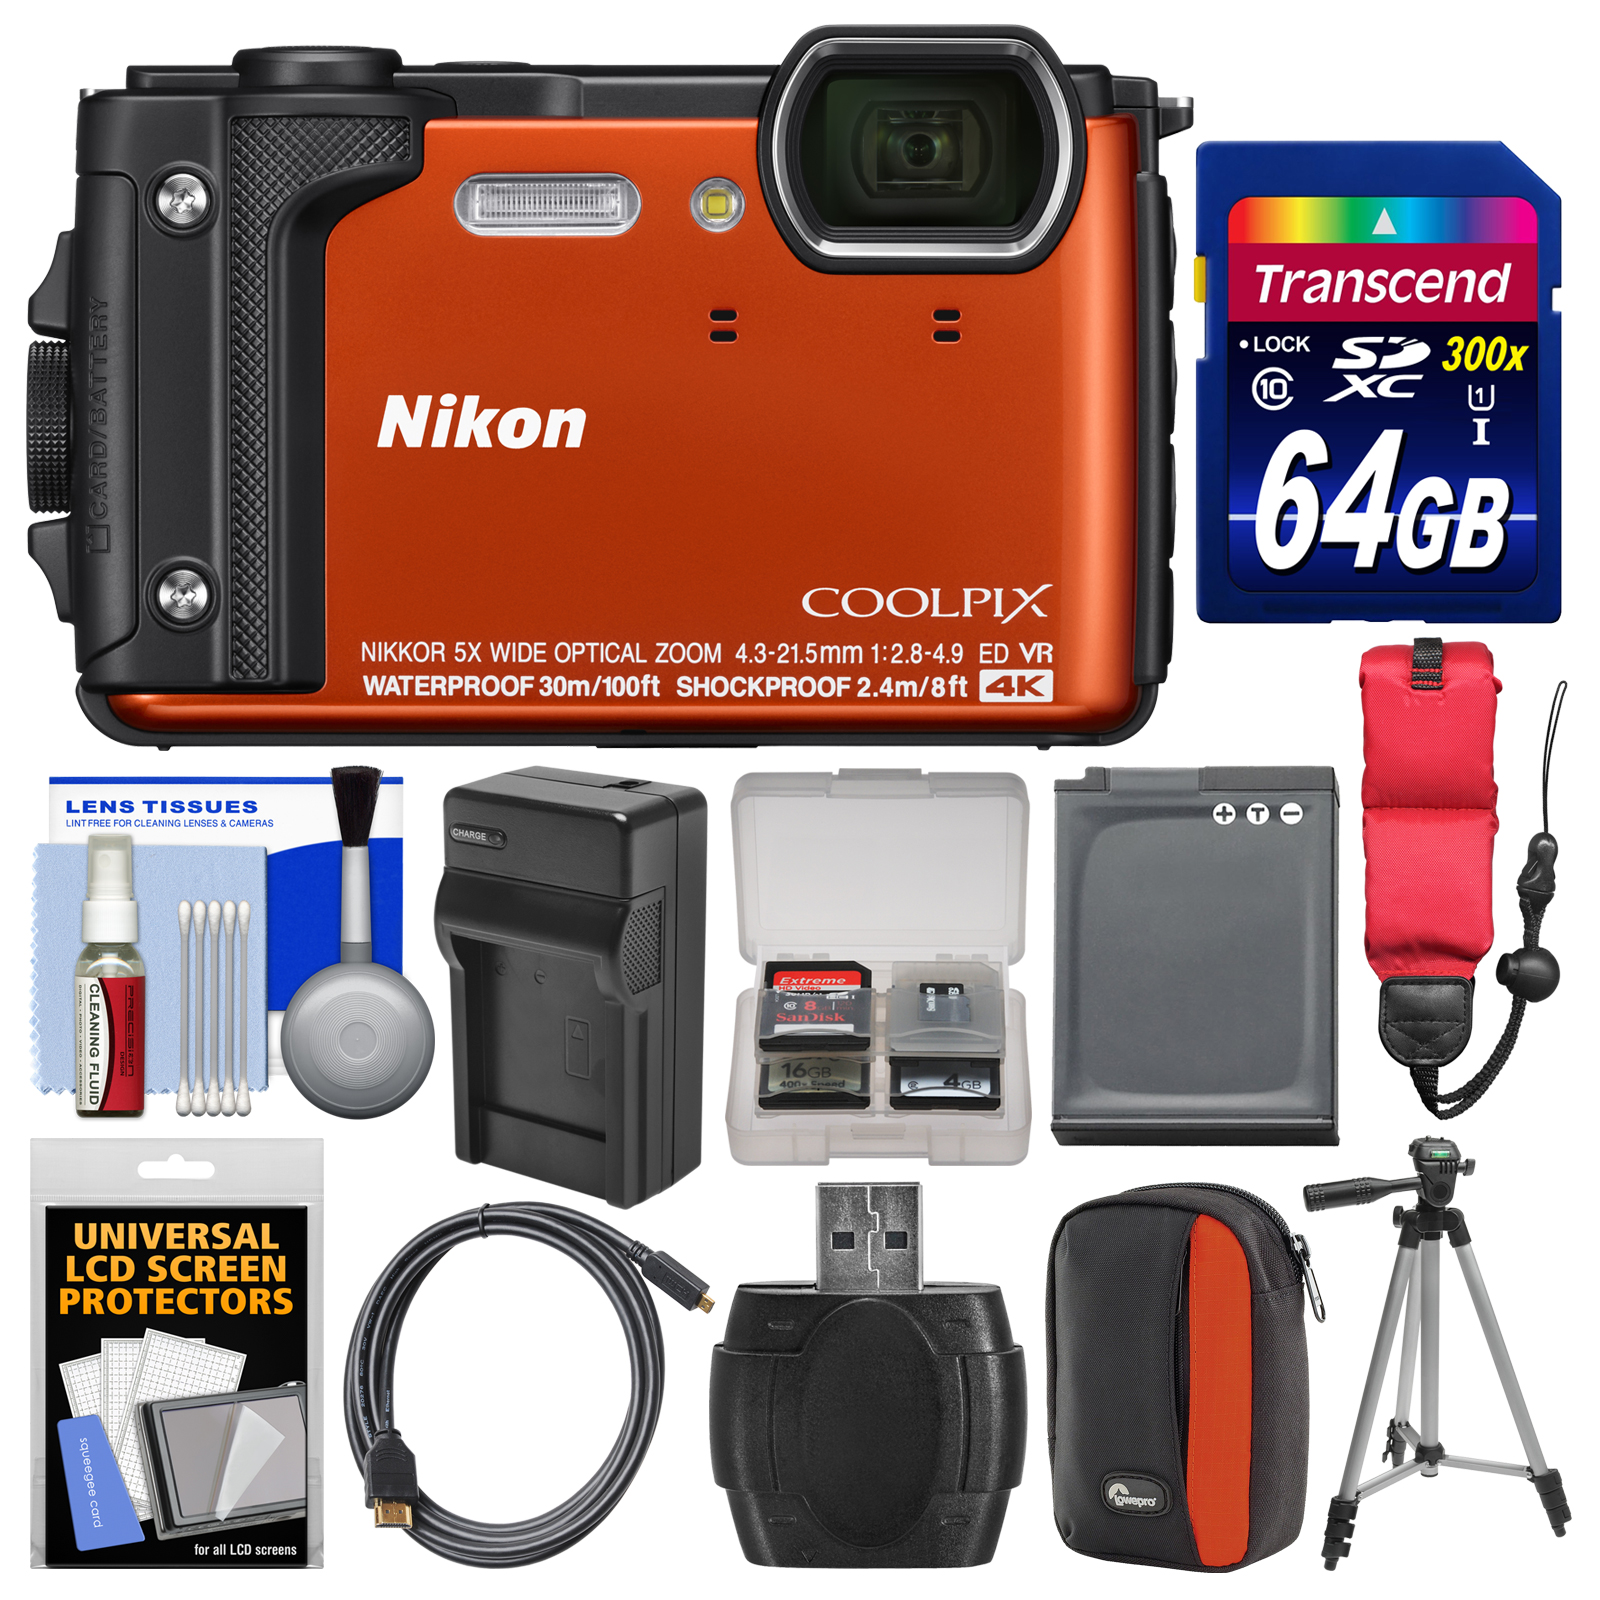 Nikon Coolpix W300 4K Wi-Fi Shock & Waterproof Digital Camera (Yellow) with 64GB Card + Case + Battery & Charger + Tripod + Float Strap + Kit